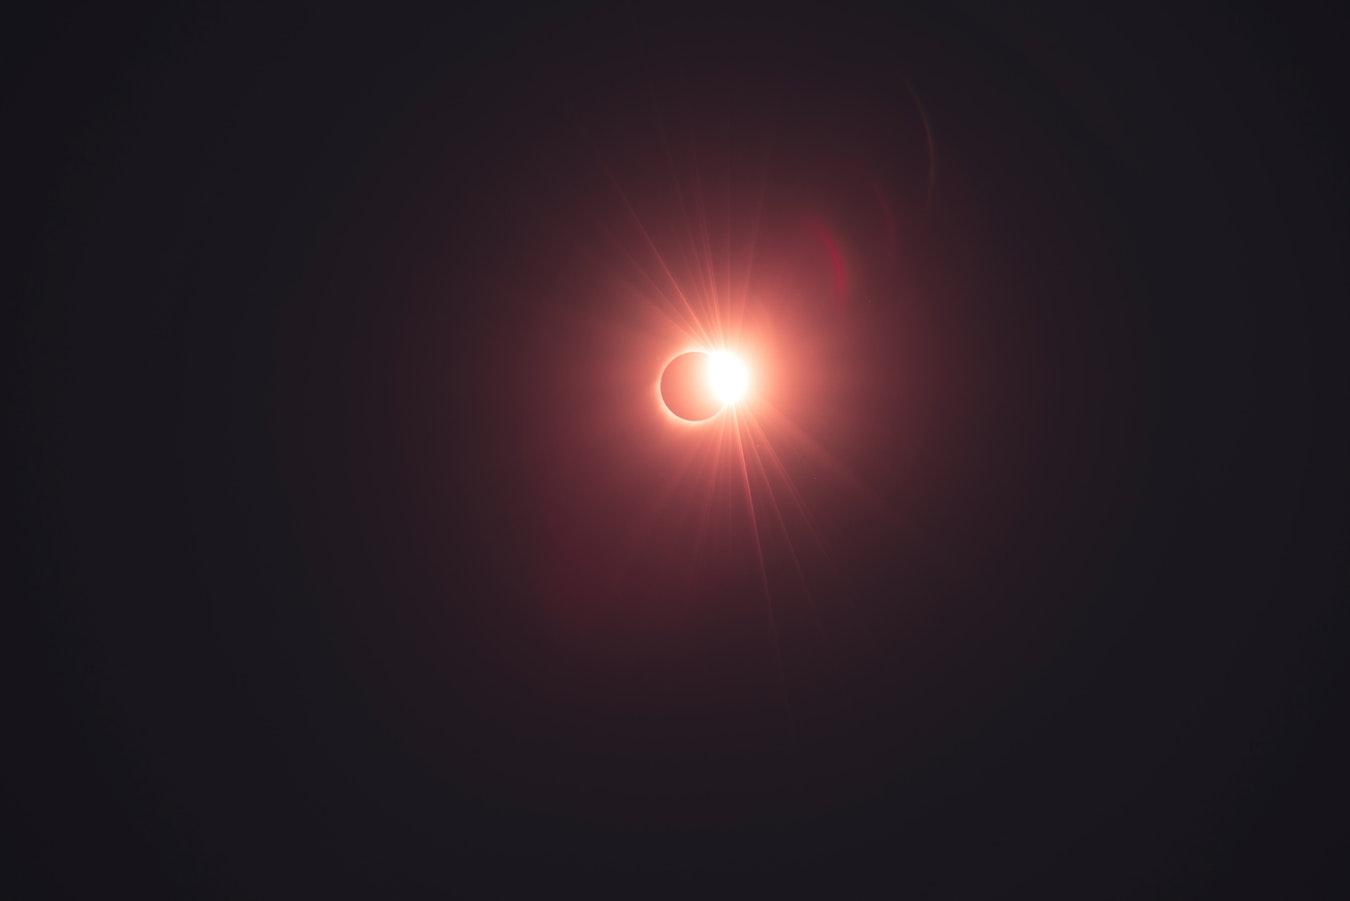 Солнце, затмение